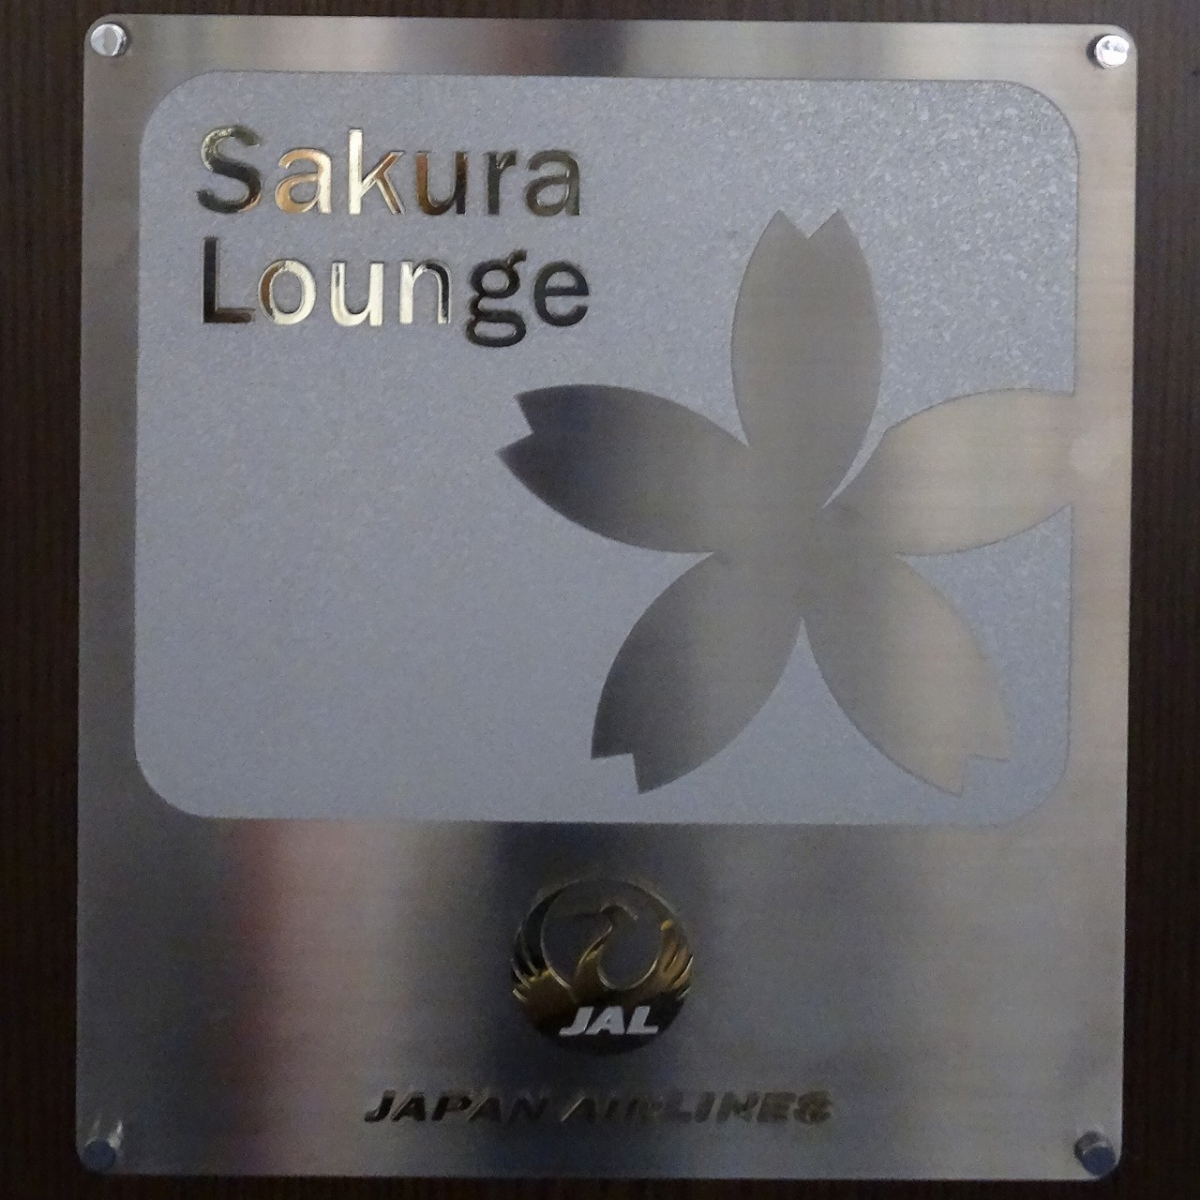 JAL CLUB ESTで羽田空港サクララウンジを利用してみた